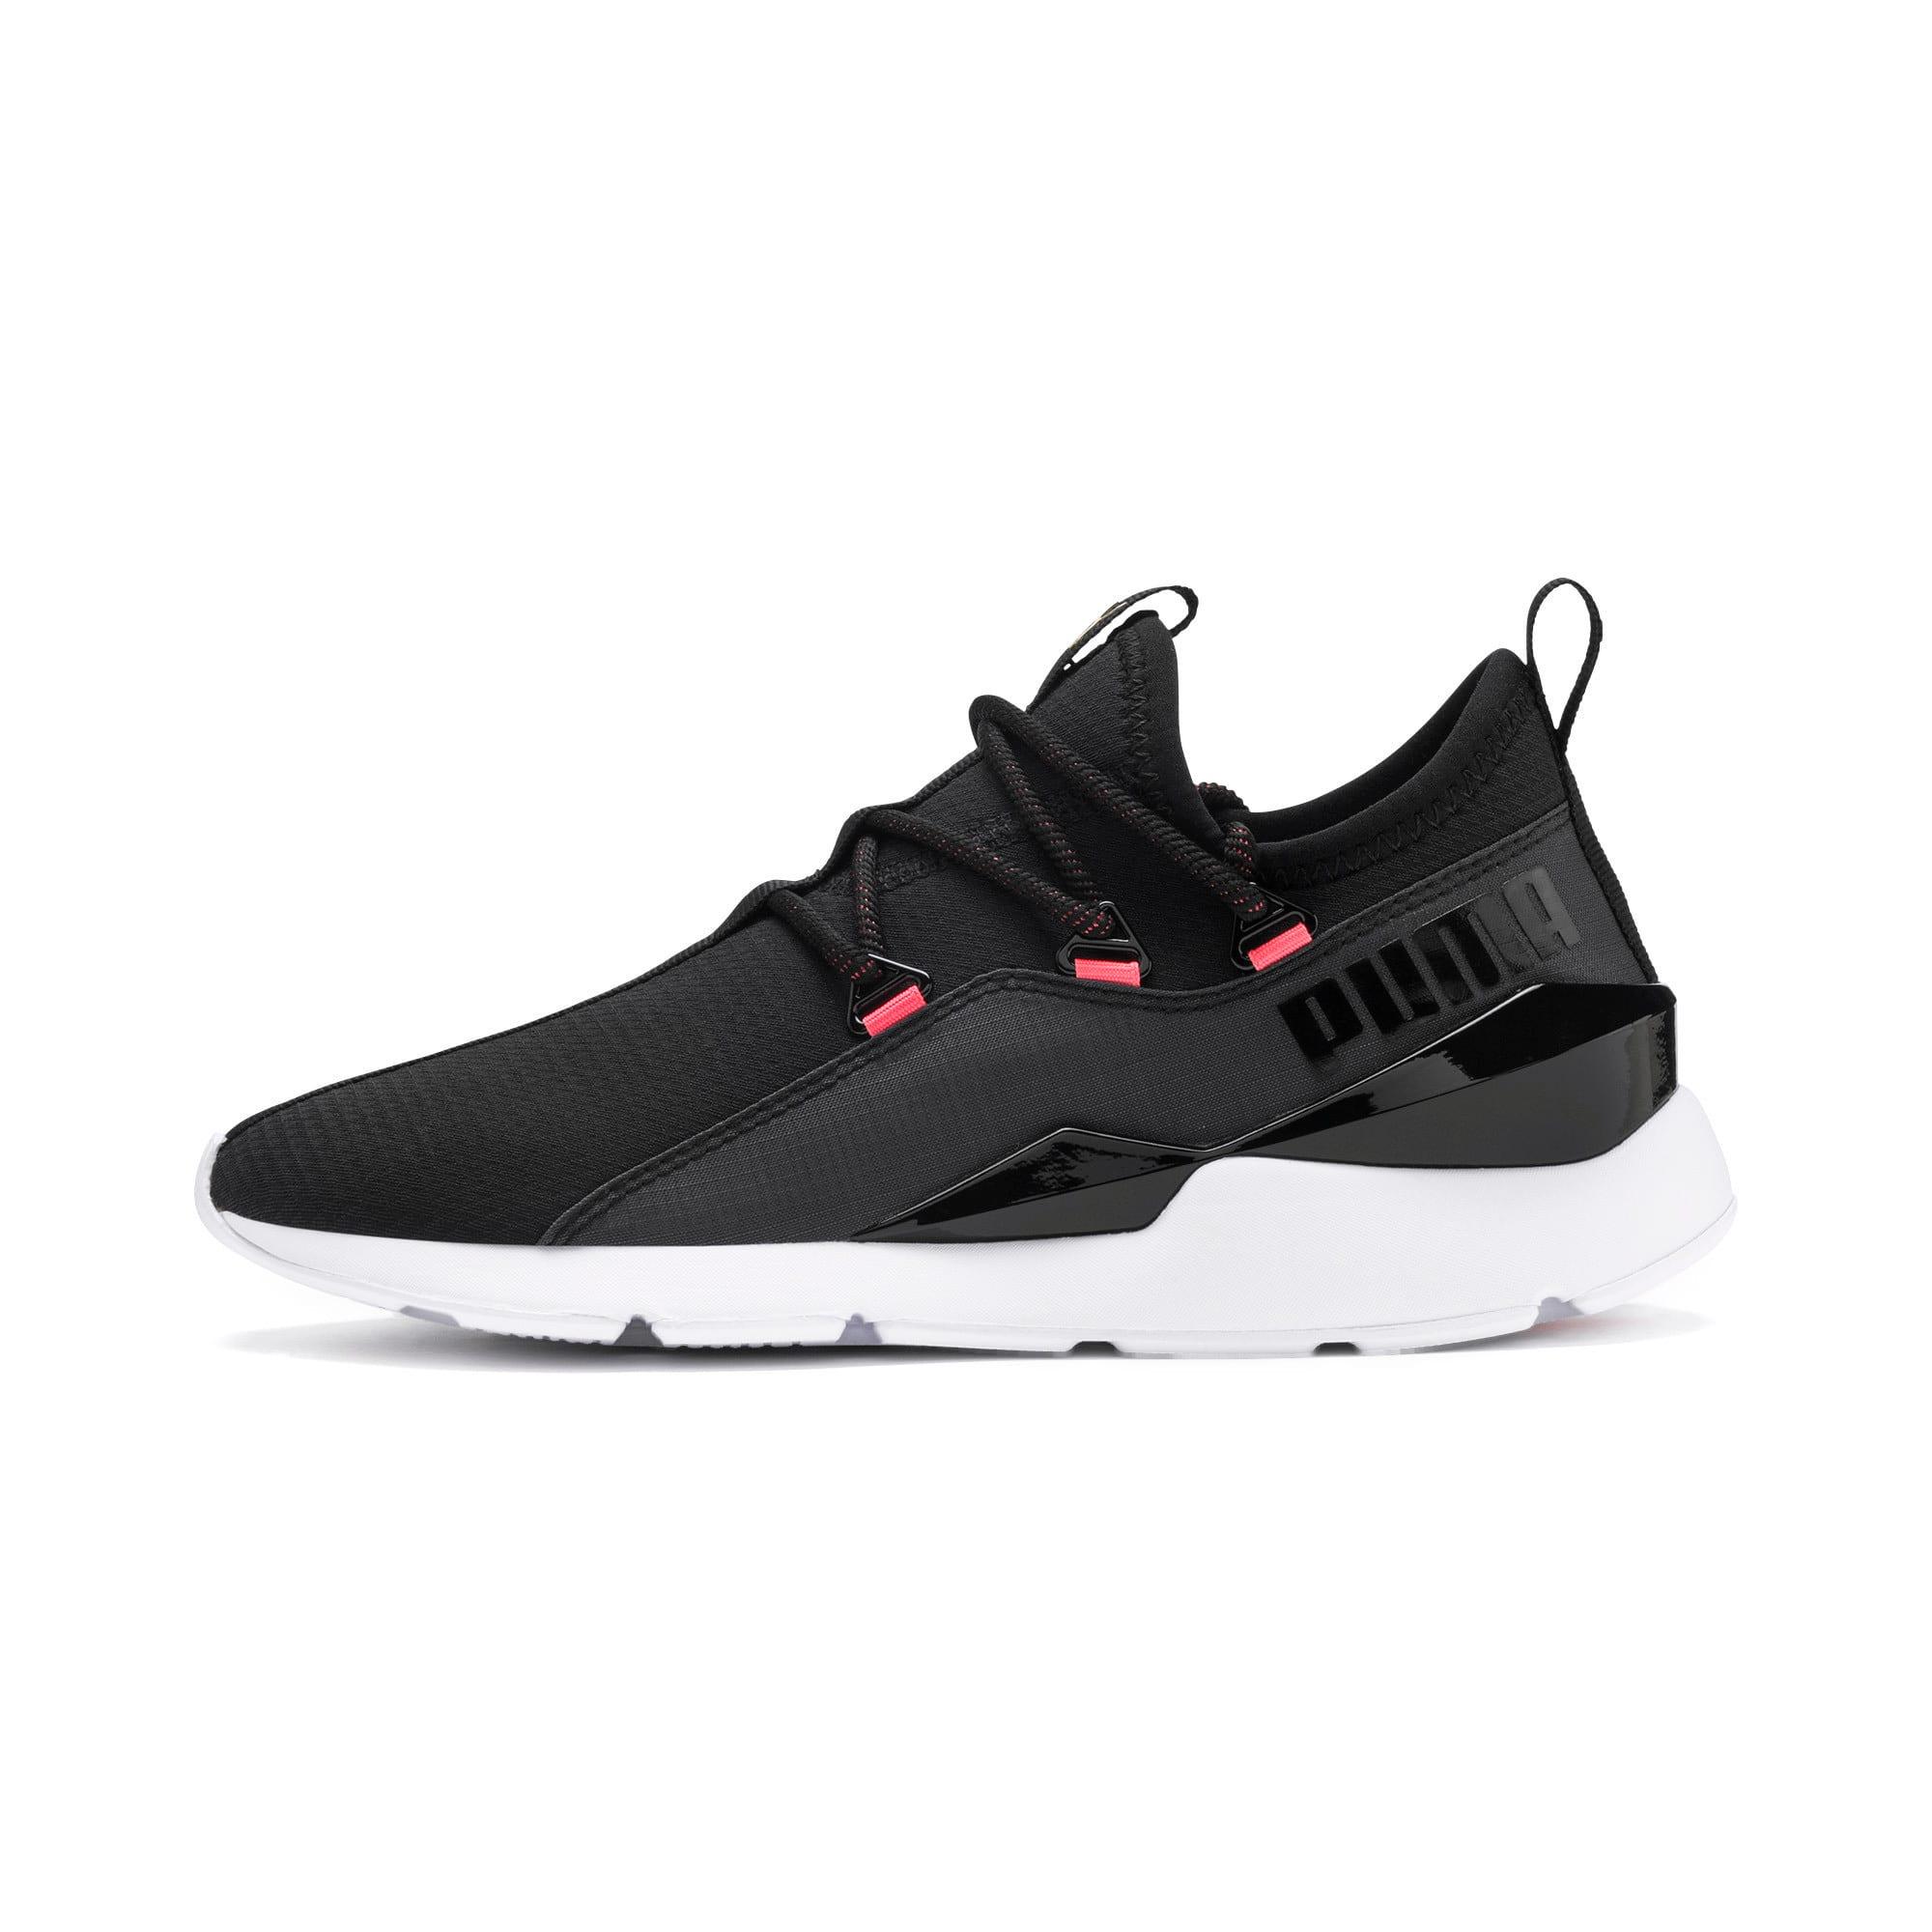 Thumbnail 1 of Muse 2 Hypertech Women's Sneakers, Puma Black-Sulphur, medium